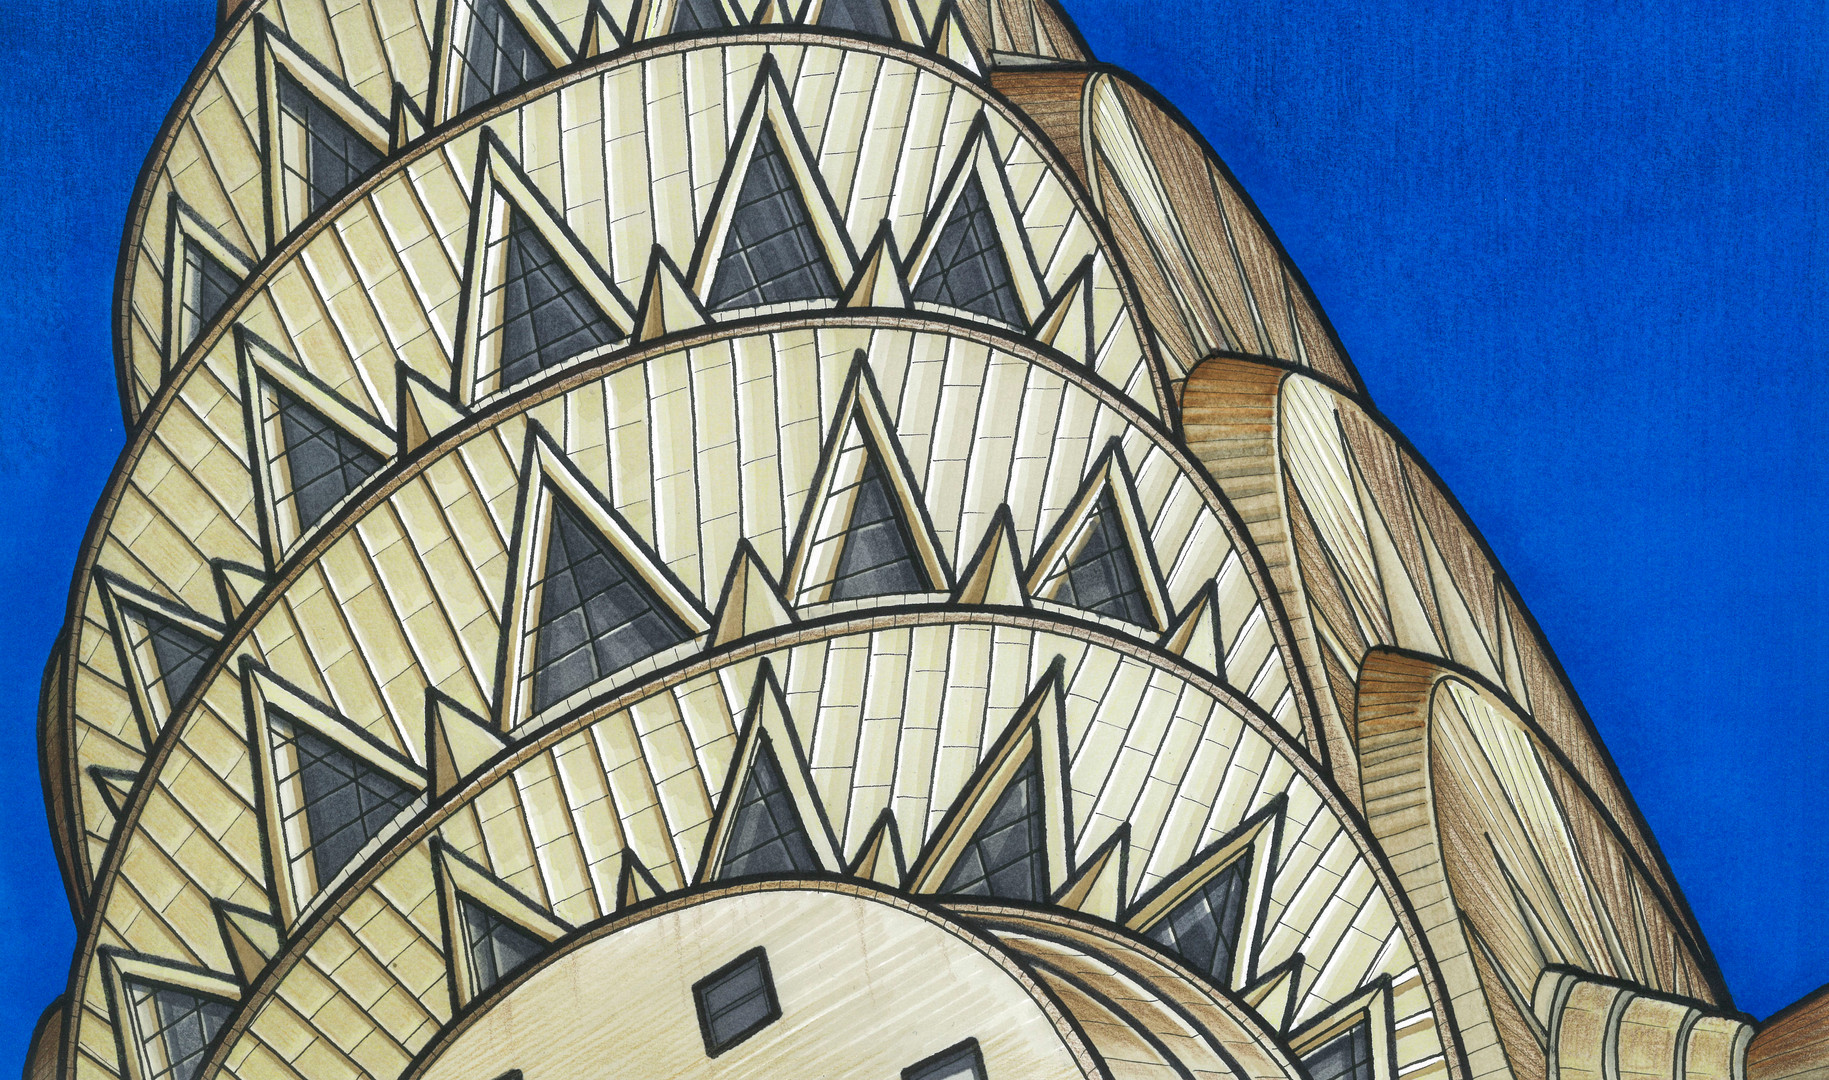 Chrysler Building illustration